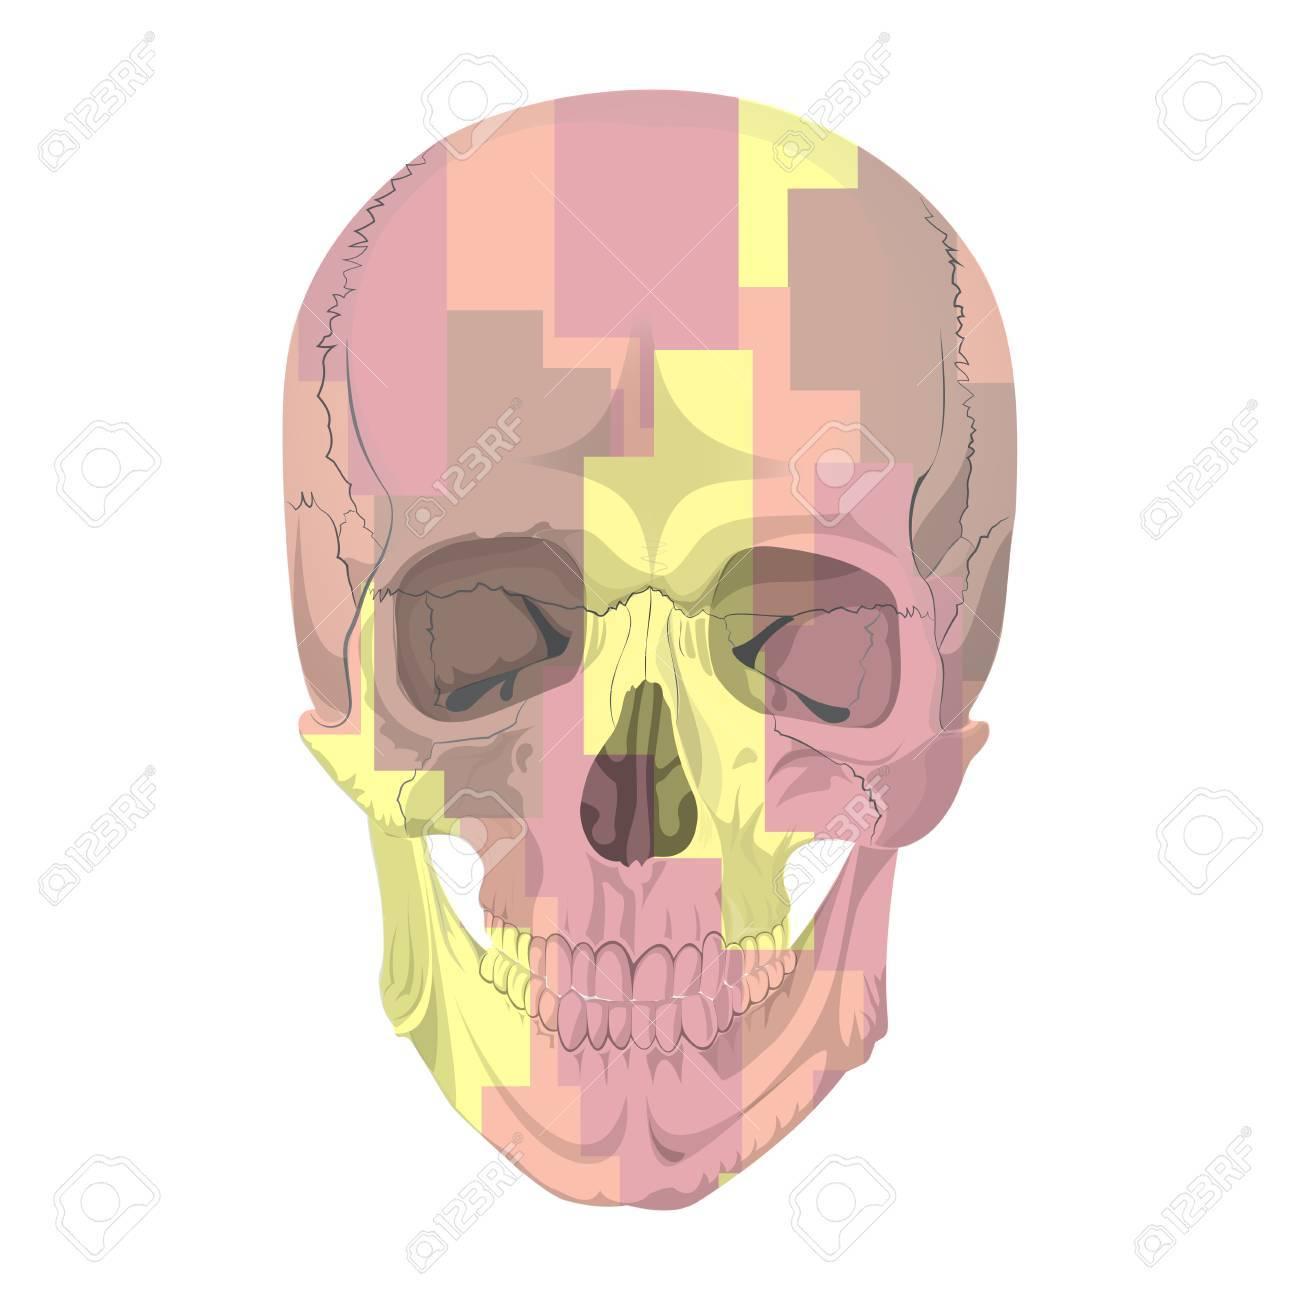 hight resolution of human skull bones skeleton dead anatomy illustration camouflage stock vector 57643287